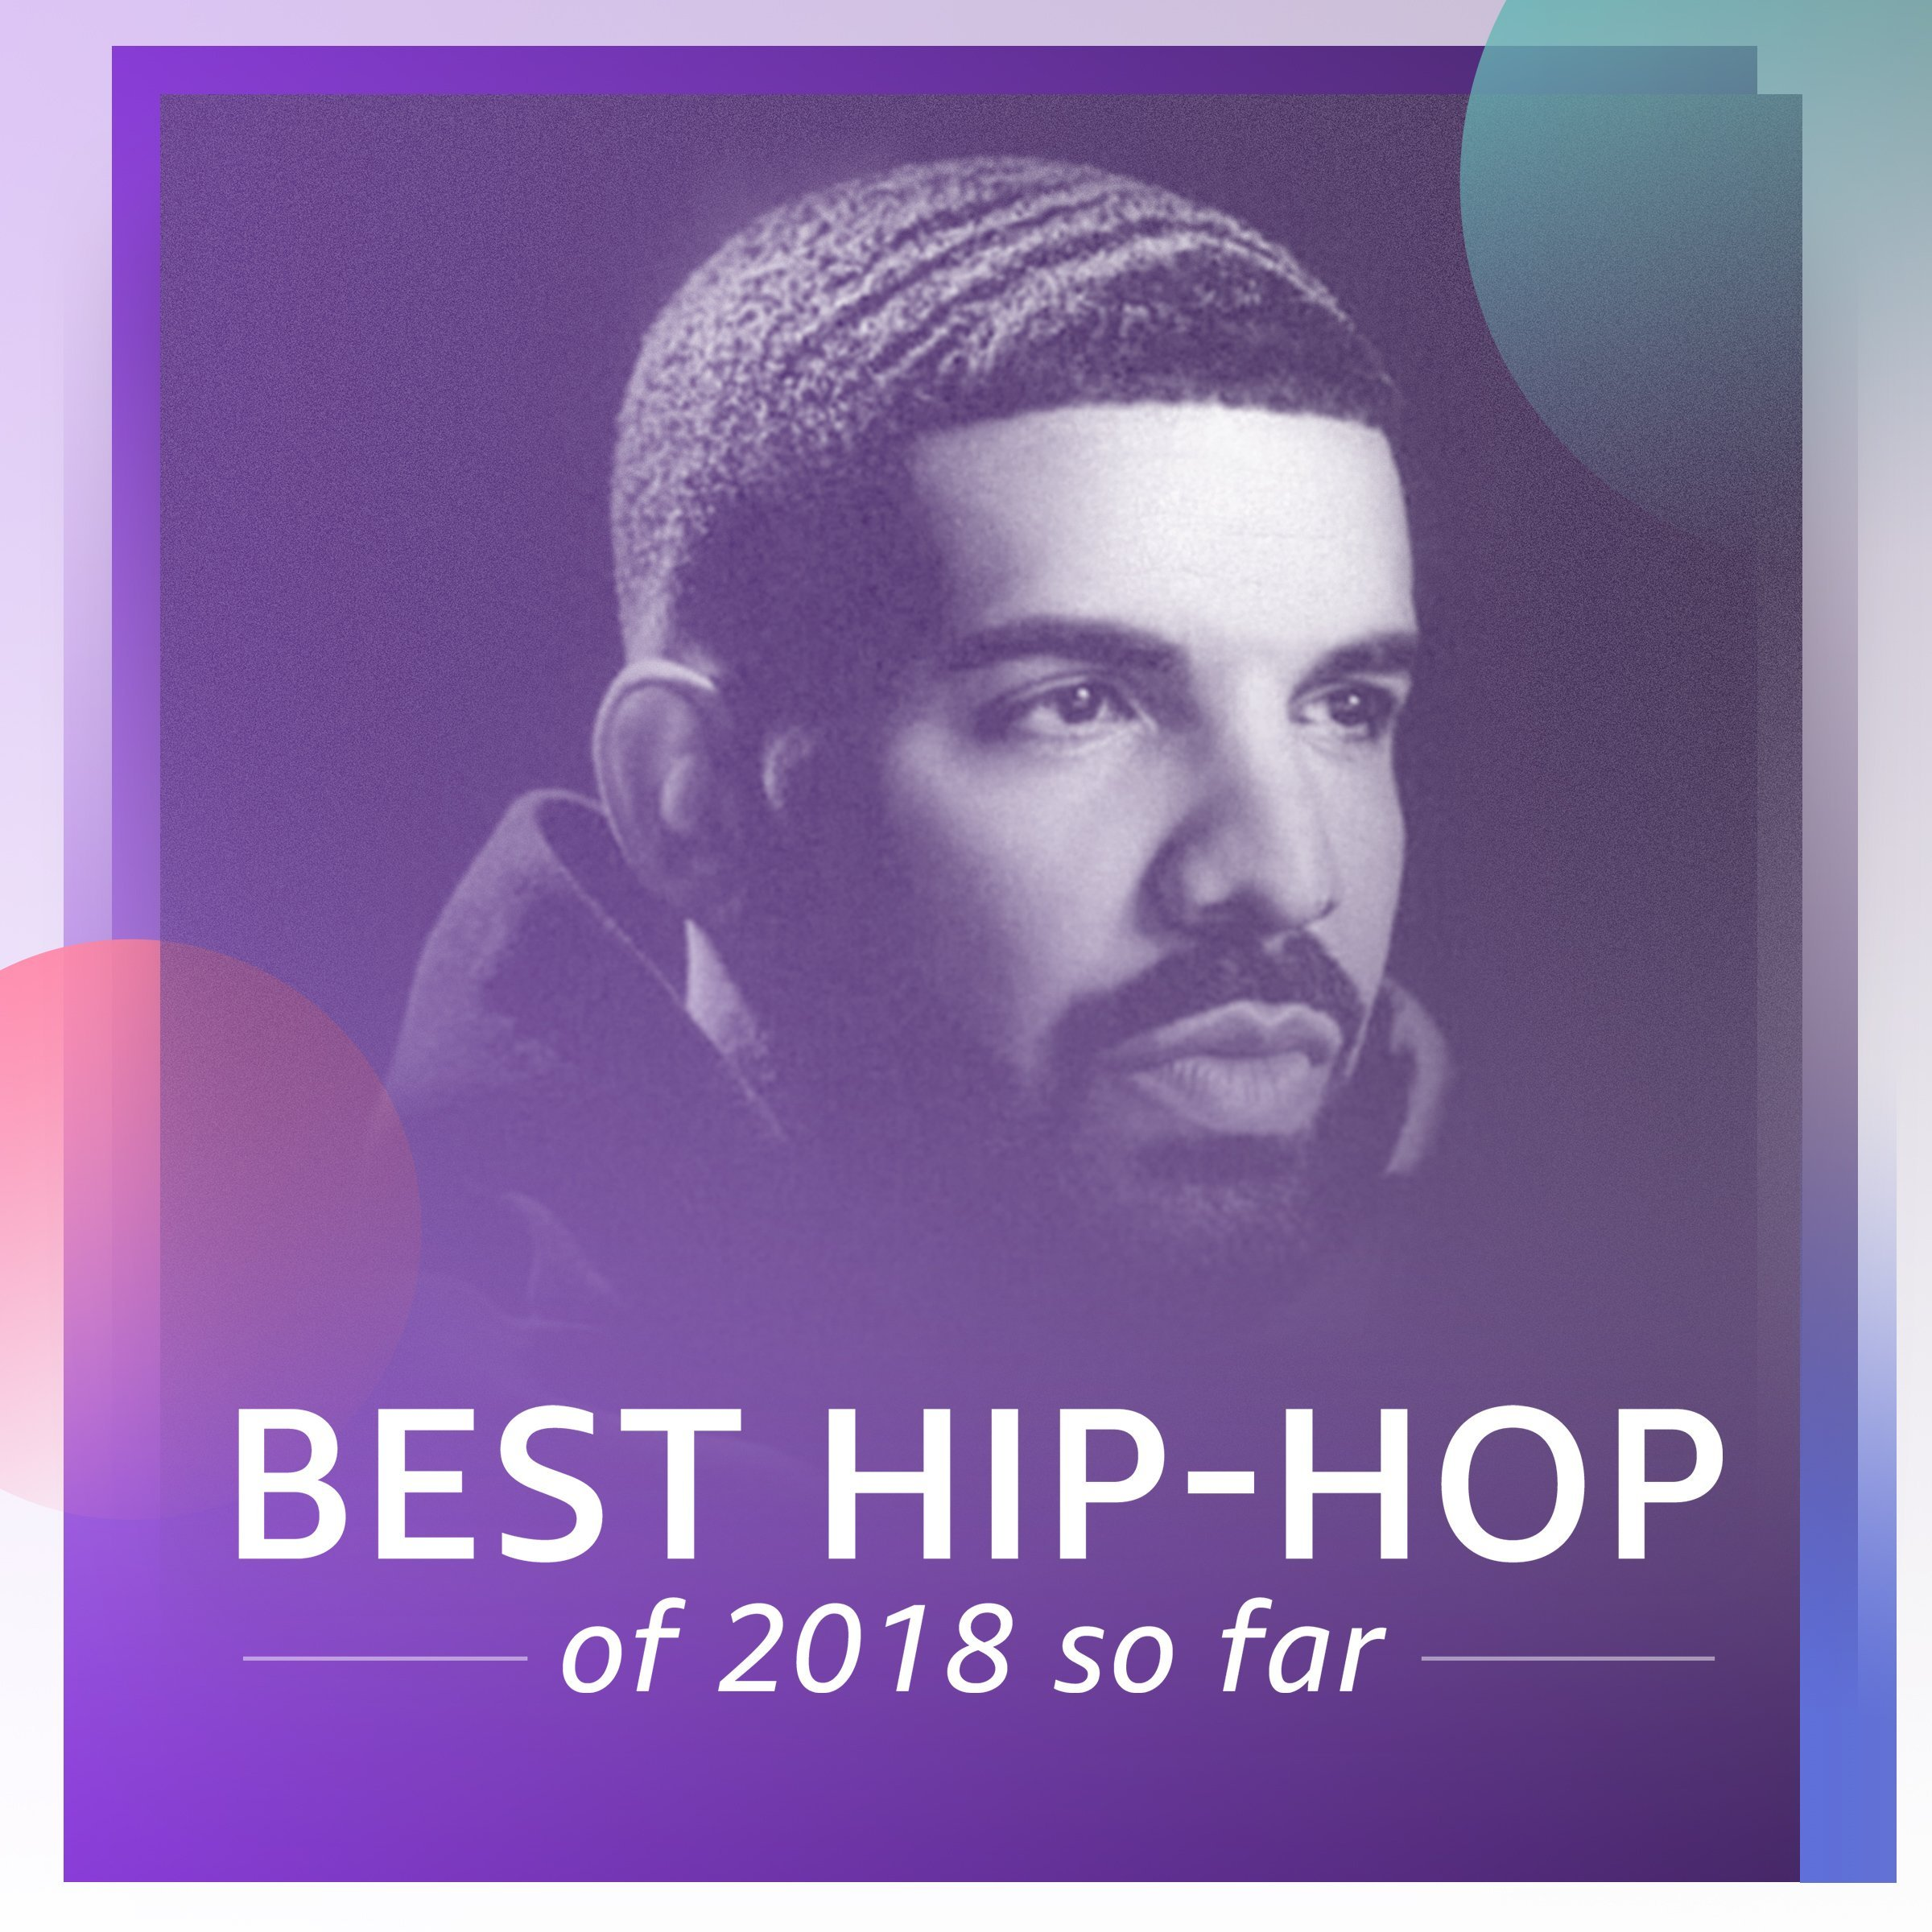 Best Hip-Hop of 2018 So Far